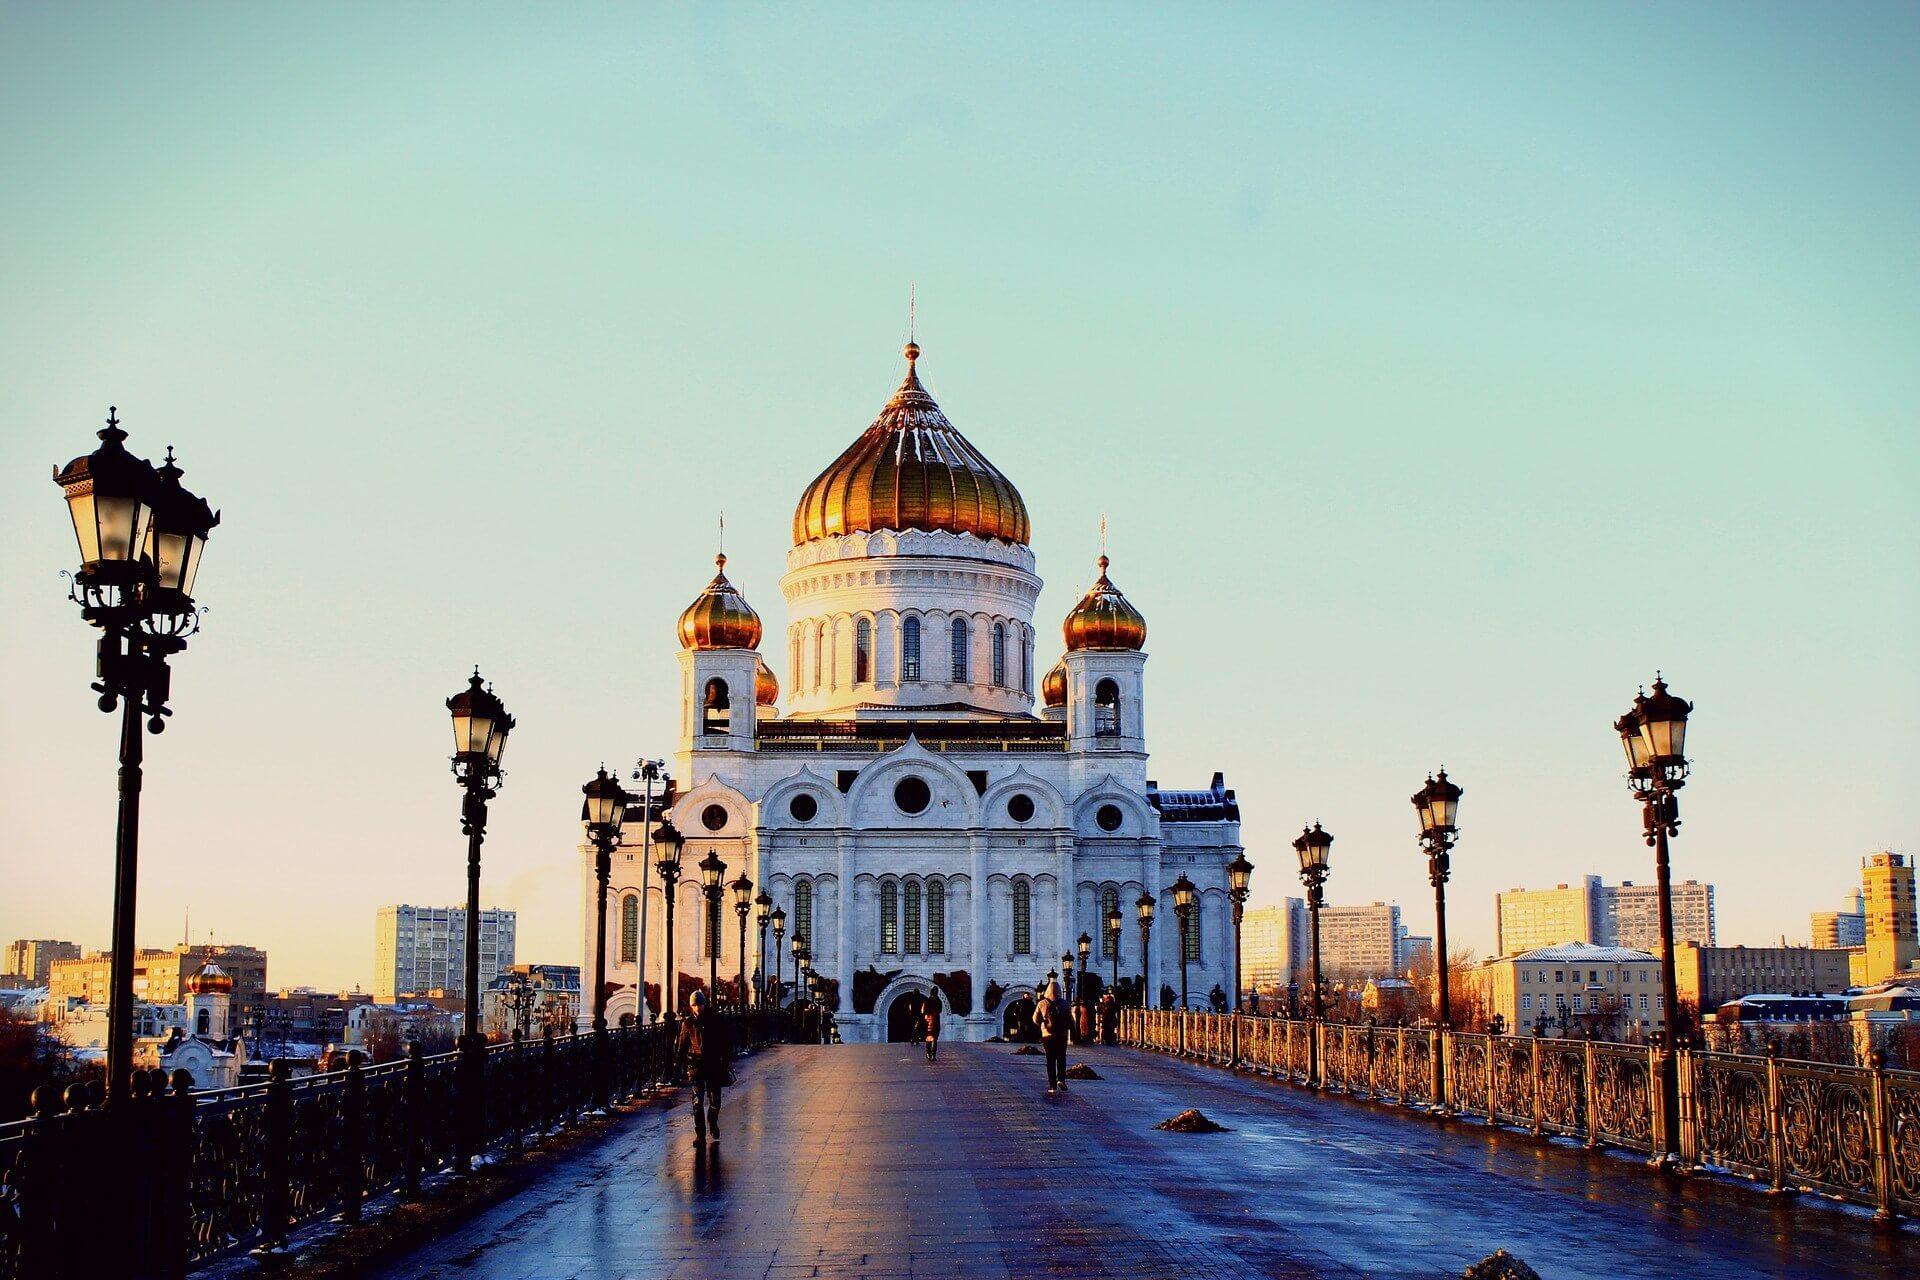 tur v rossiju sankt peterburg 15 870 rub chel - Тур в Россию Санкт-Петербург 15 870 руб. чел.